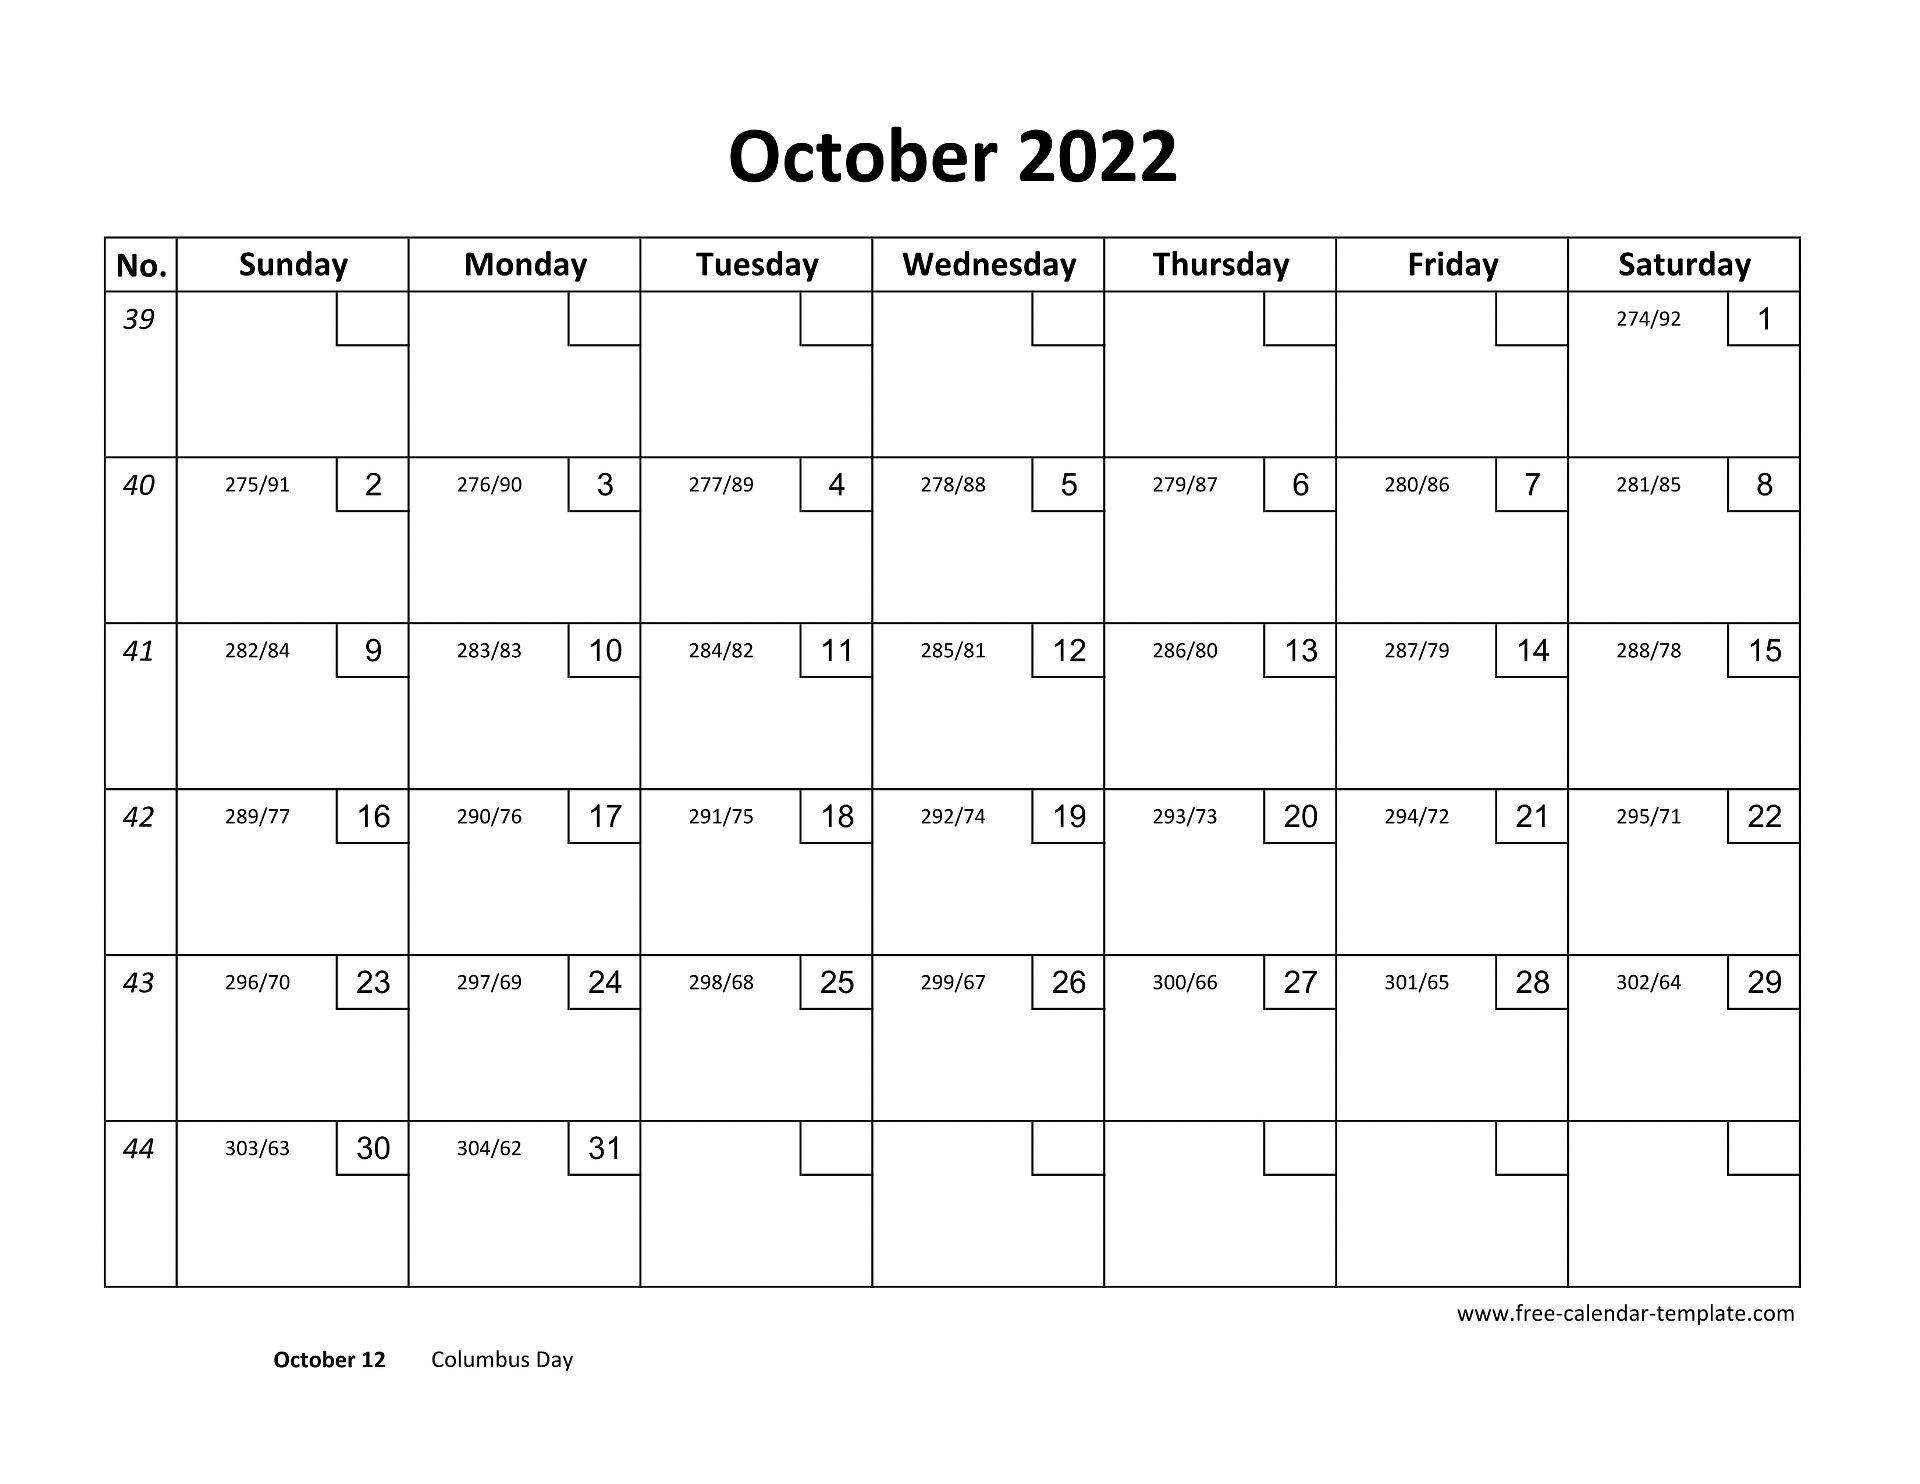 October 2022 Free Calendar Tempplate   Free-calendar ...